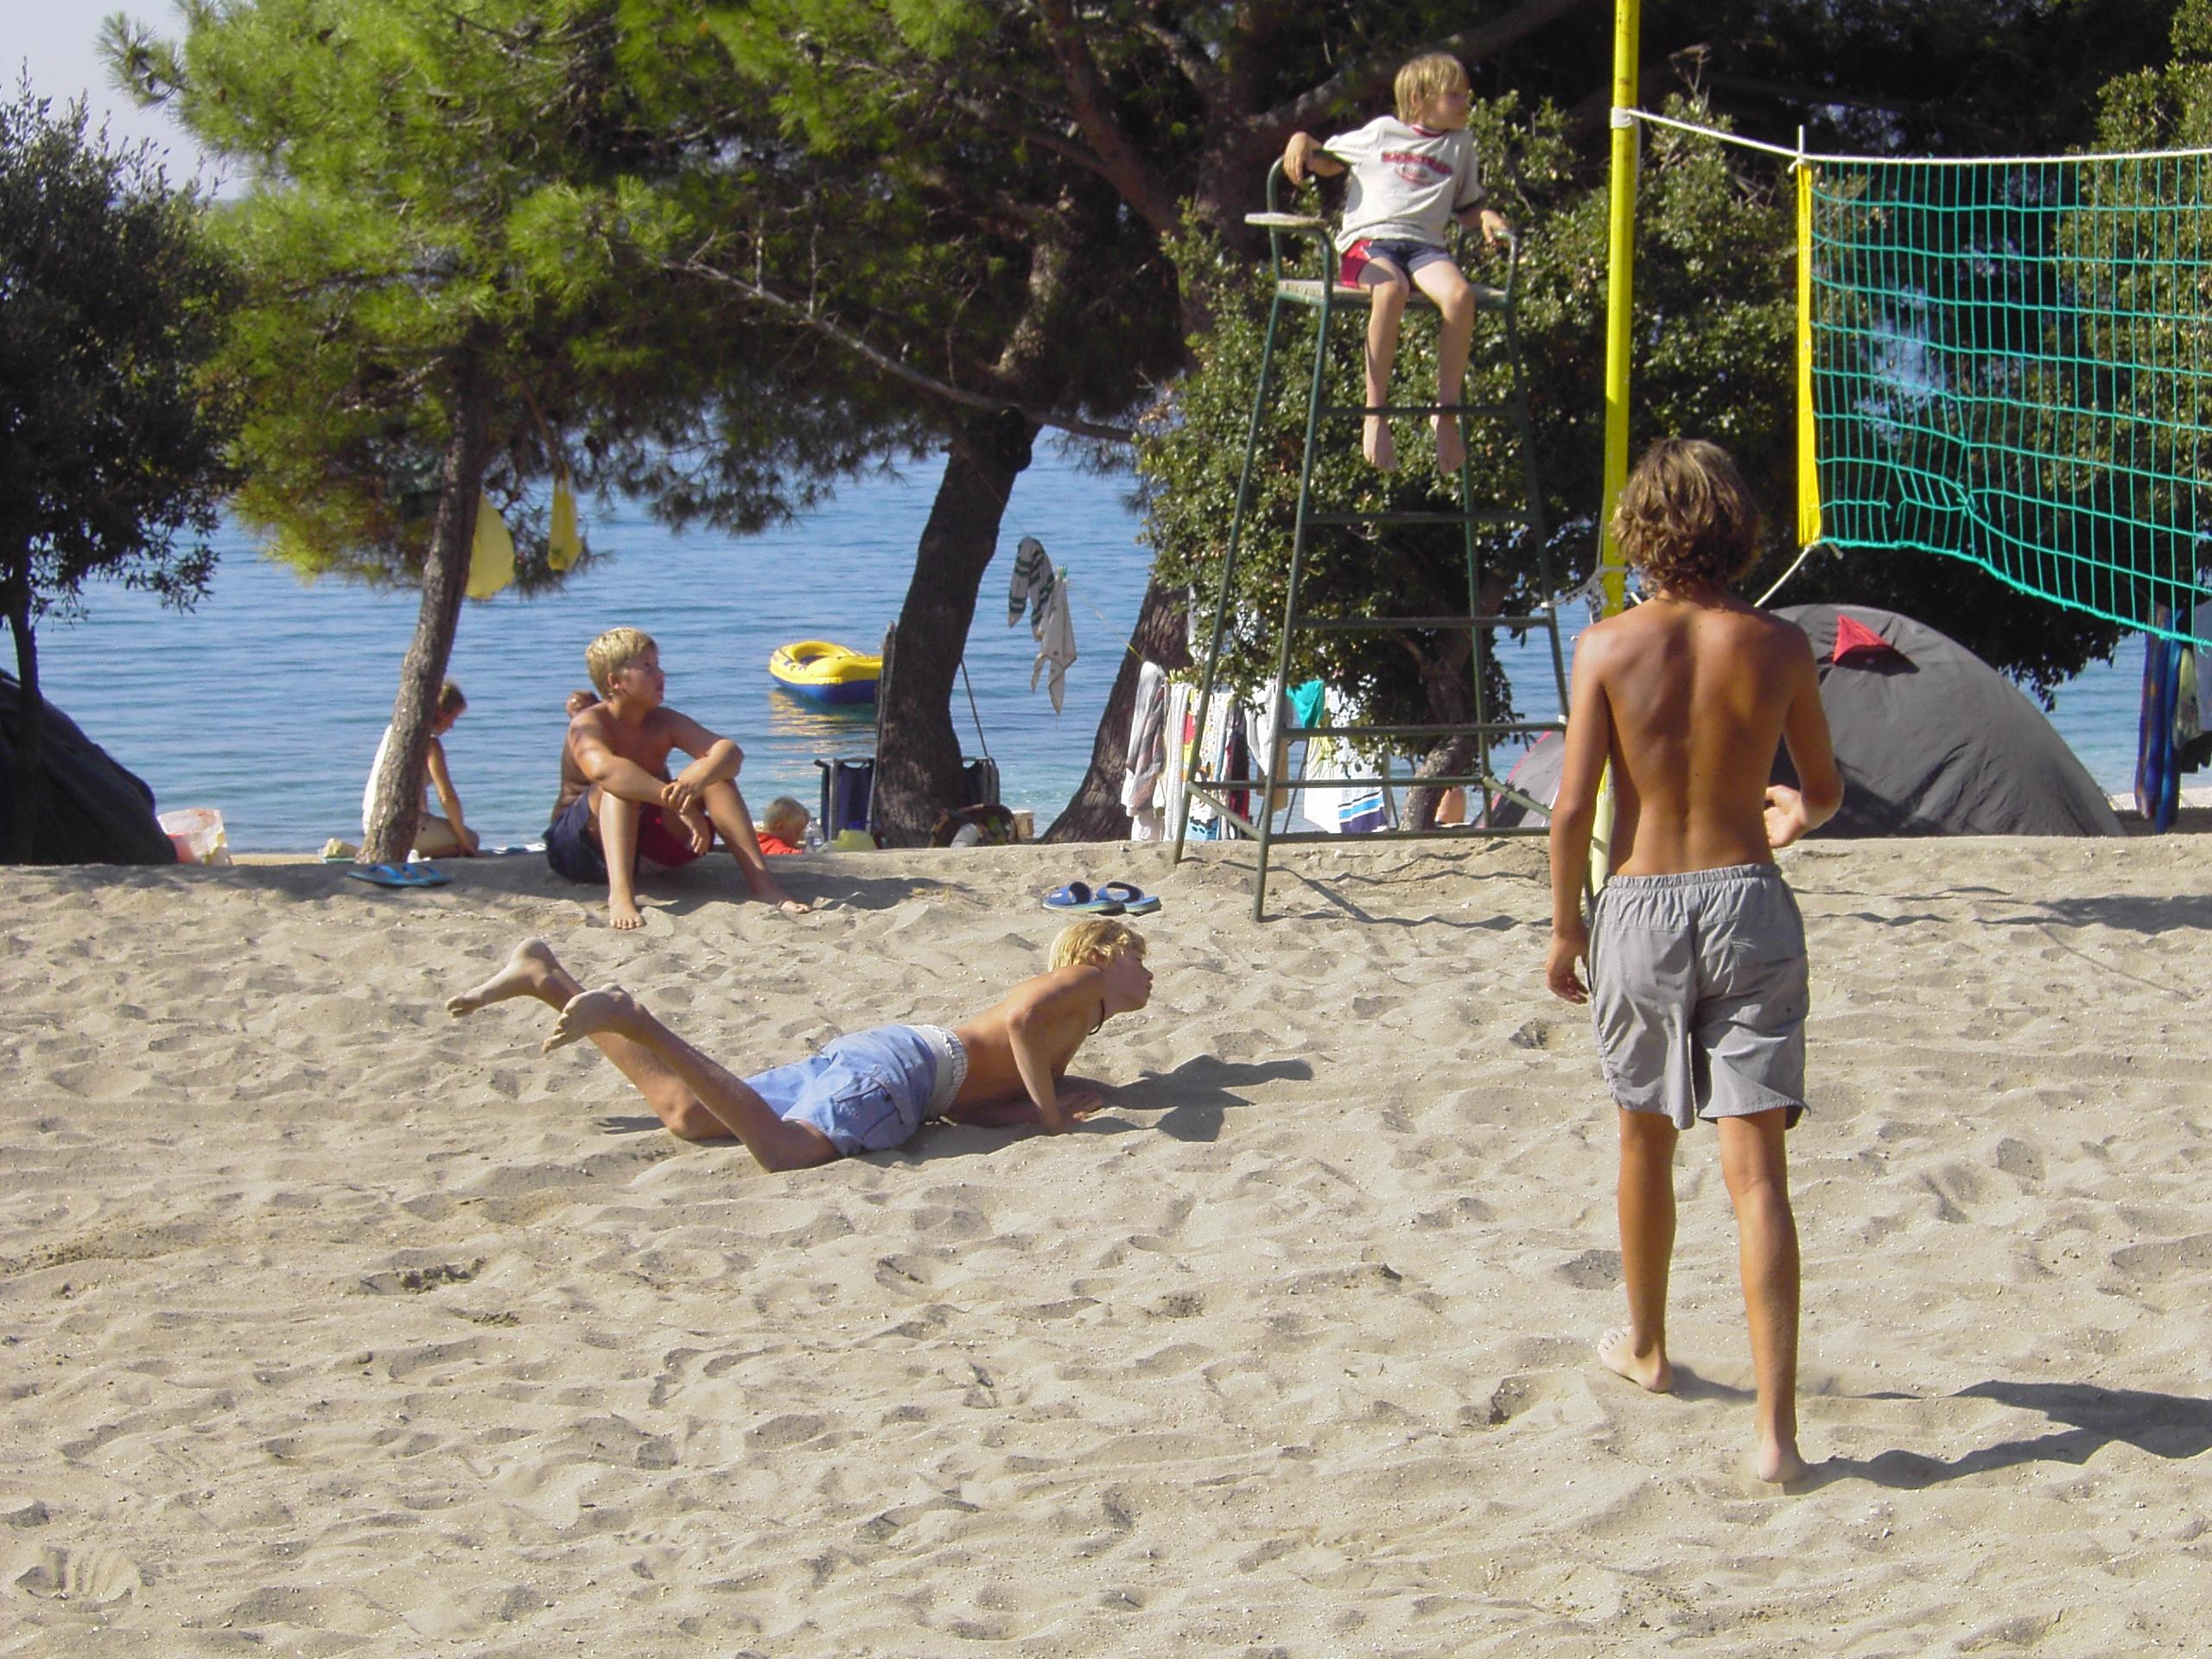 Armin Dollinger Beachvolleyball in jungen Jahren.